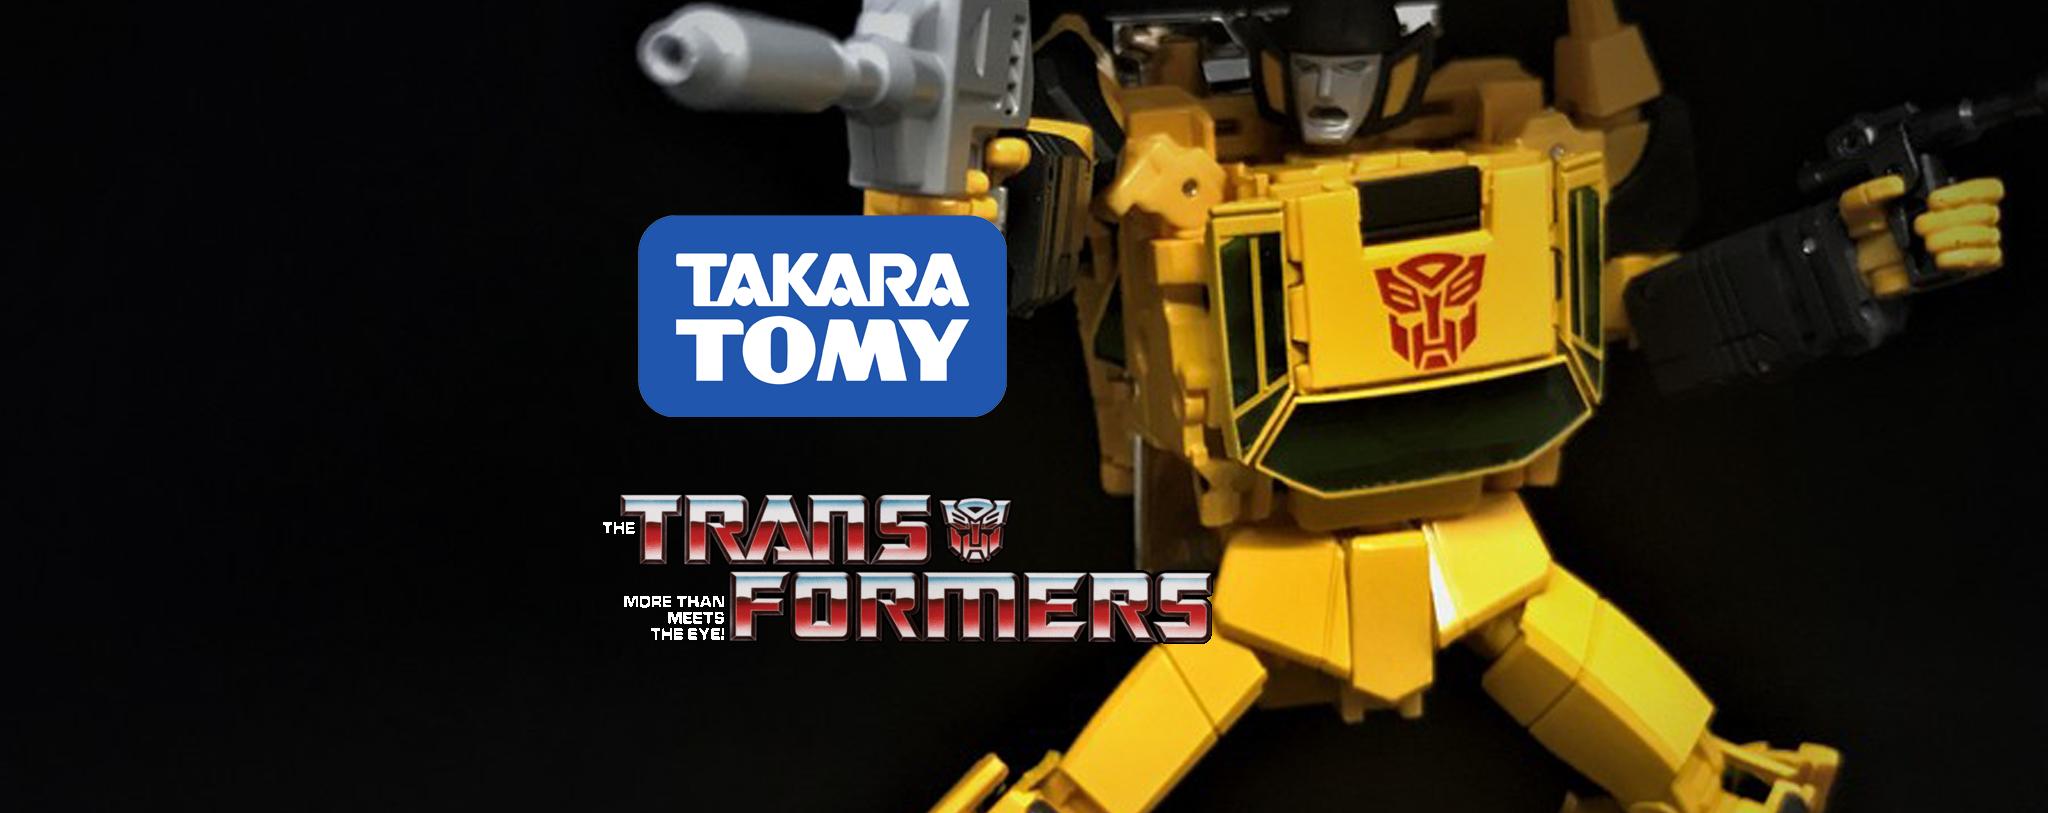 Recensione: Sunstreaker MP-39 Transformers Masterpiece